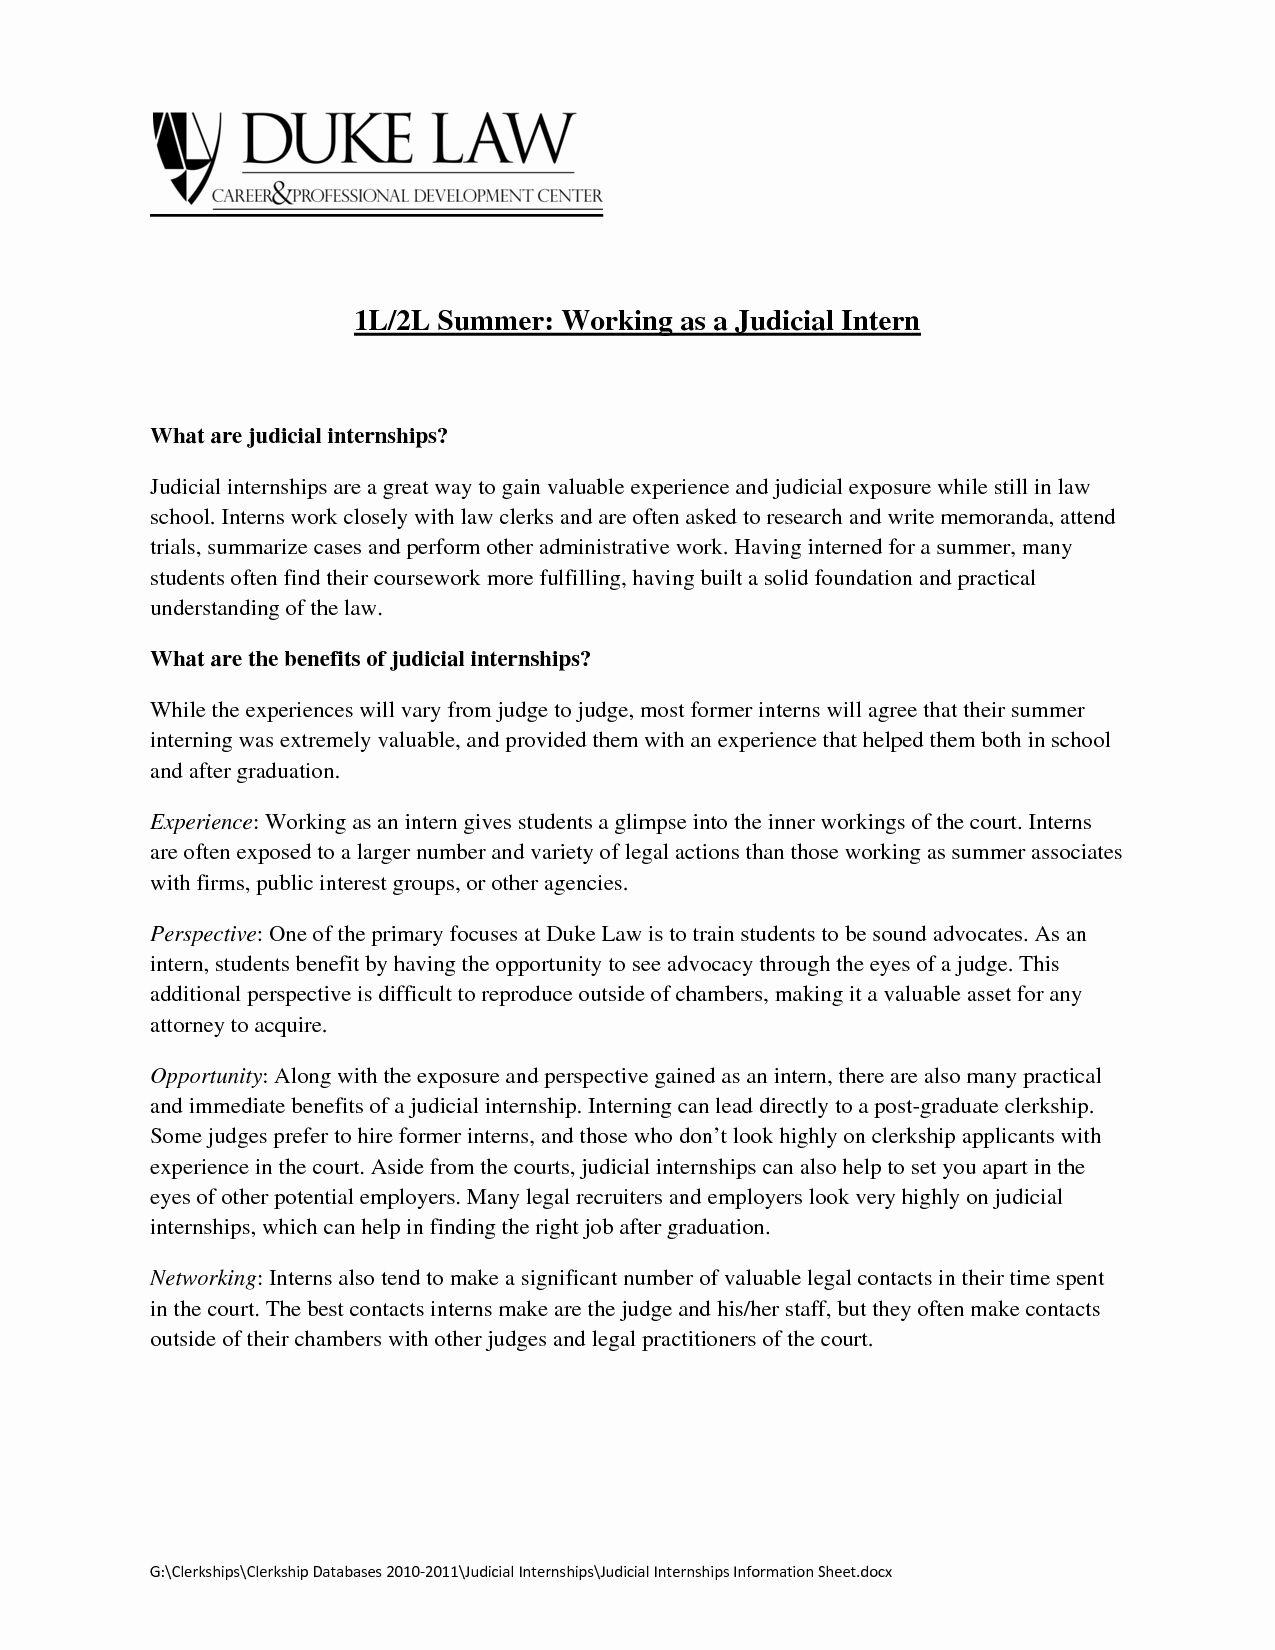 sample judicial clerkship cover letter harvard